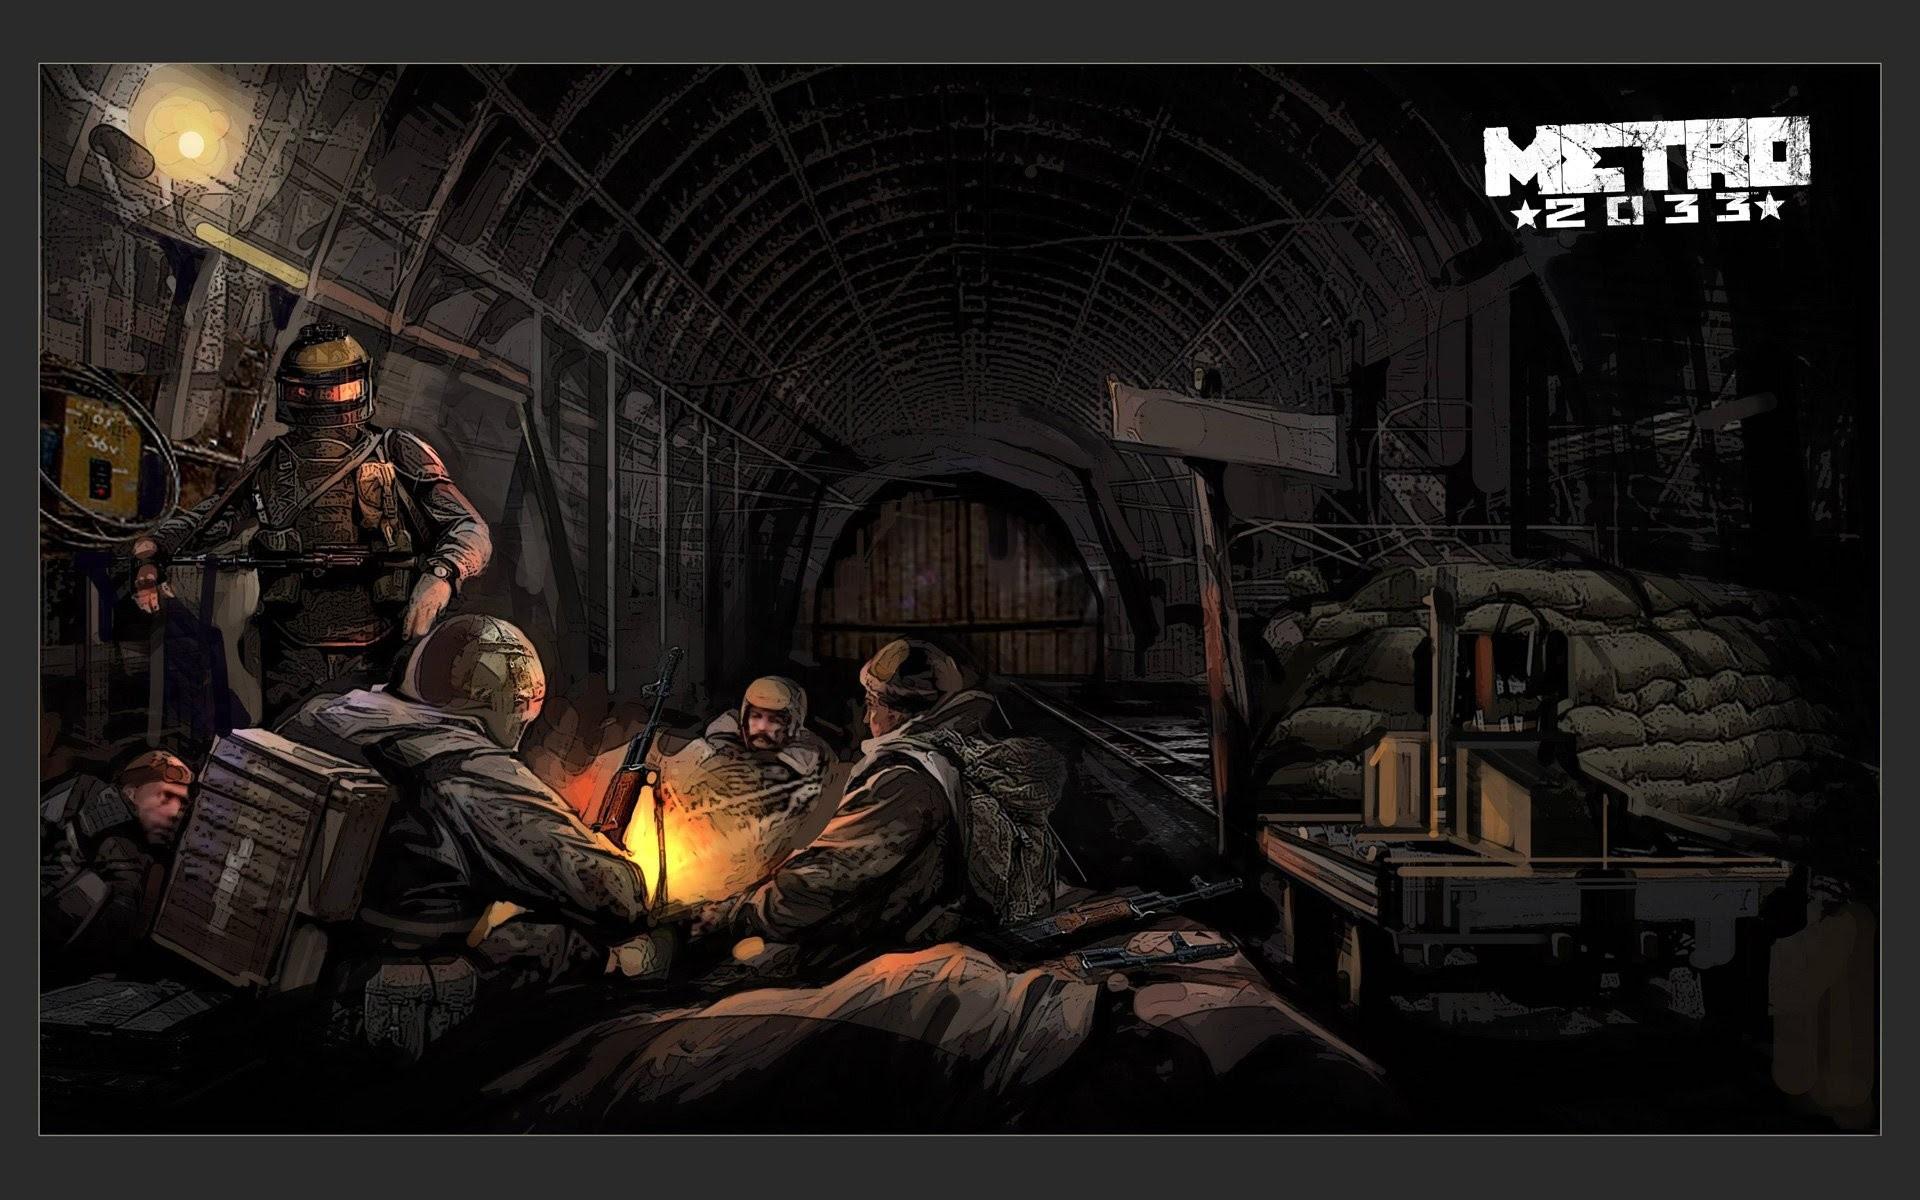 Metro 2033 Wallpaper Hd